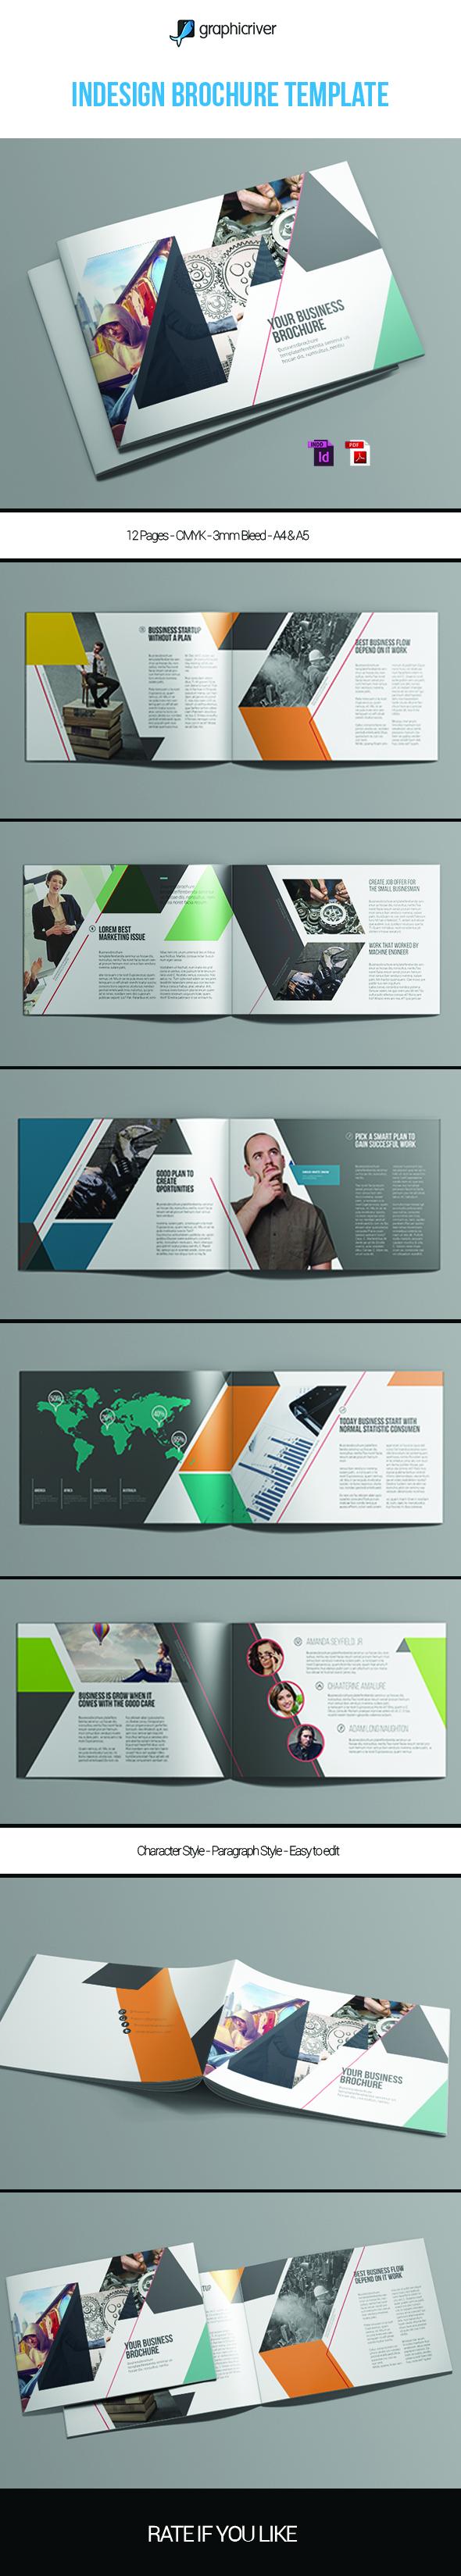 Indesign Brochure Template Vol.1   Pinterest   Diseño editorial ...